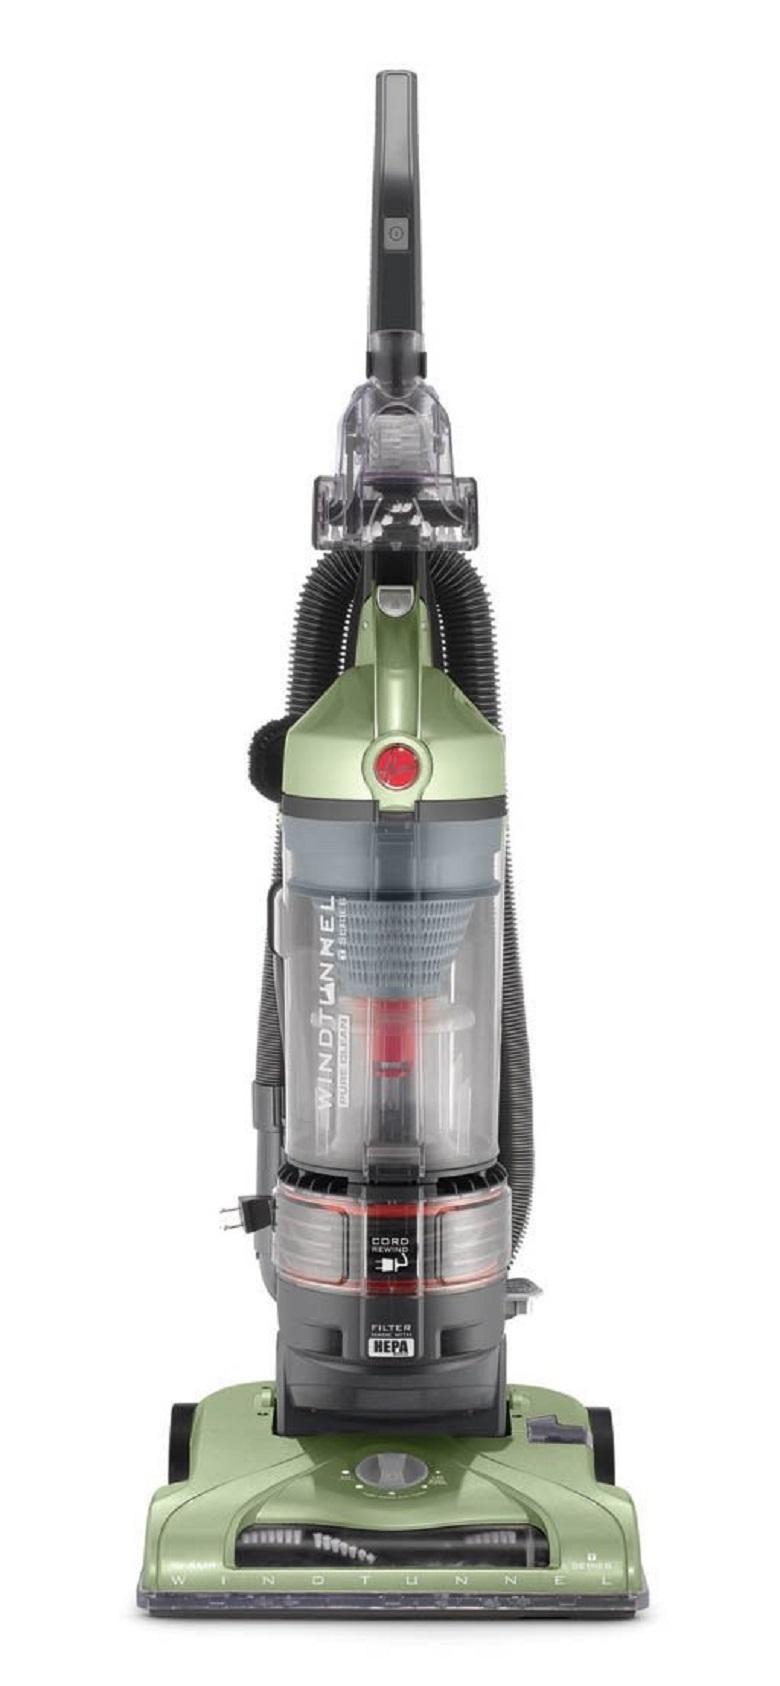 Hoover WindTunnel T-Series Rewind Plus Bagless Upright, UH70120, hoover upright vacuum, upright vacuum